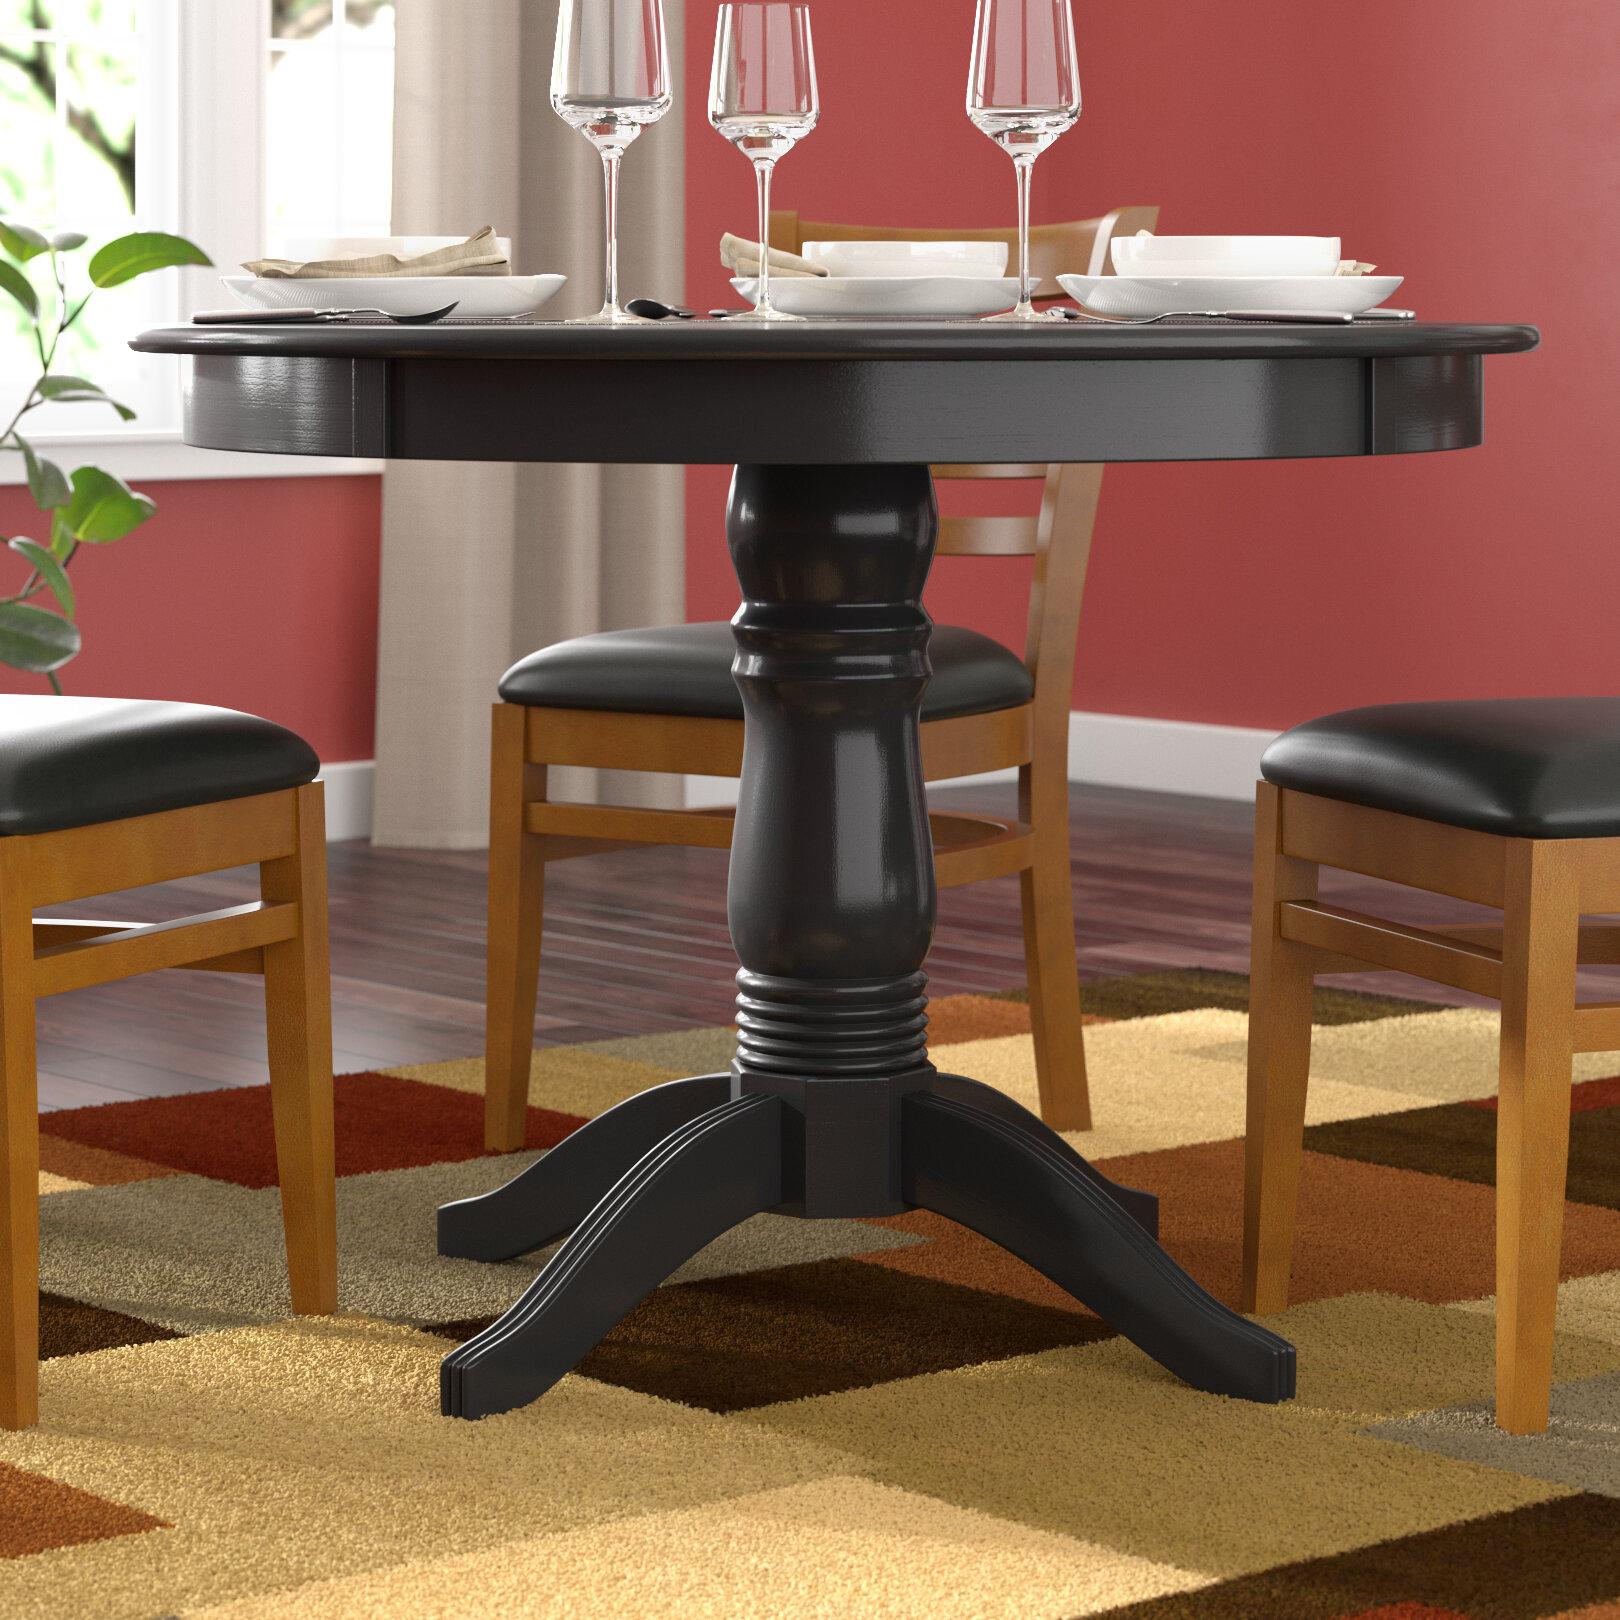 Rehausser Une Table De Salle A Manger table de salle à manger en bois massif oneill